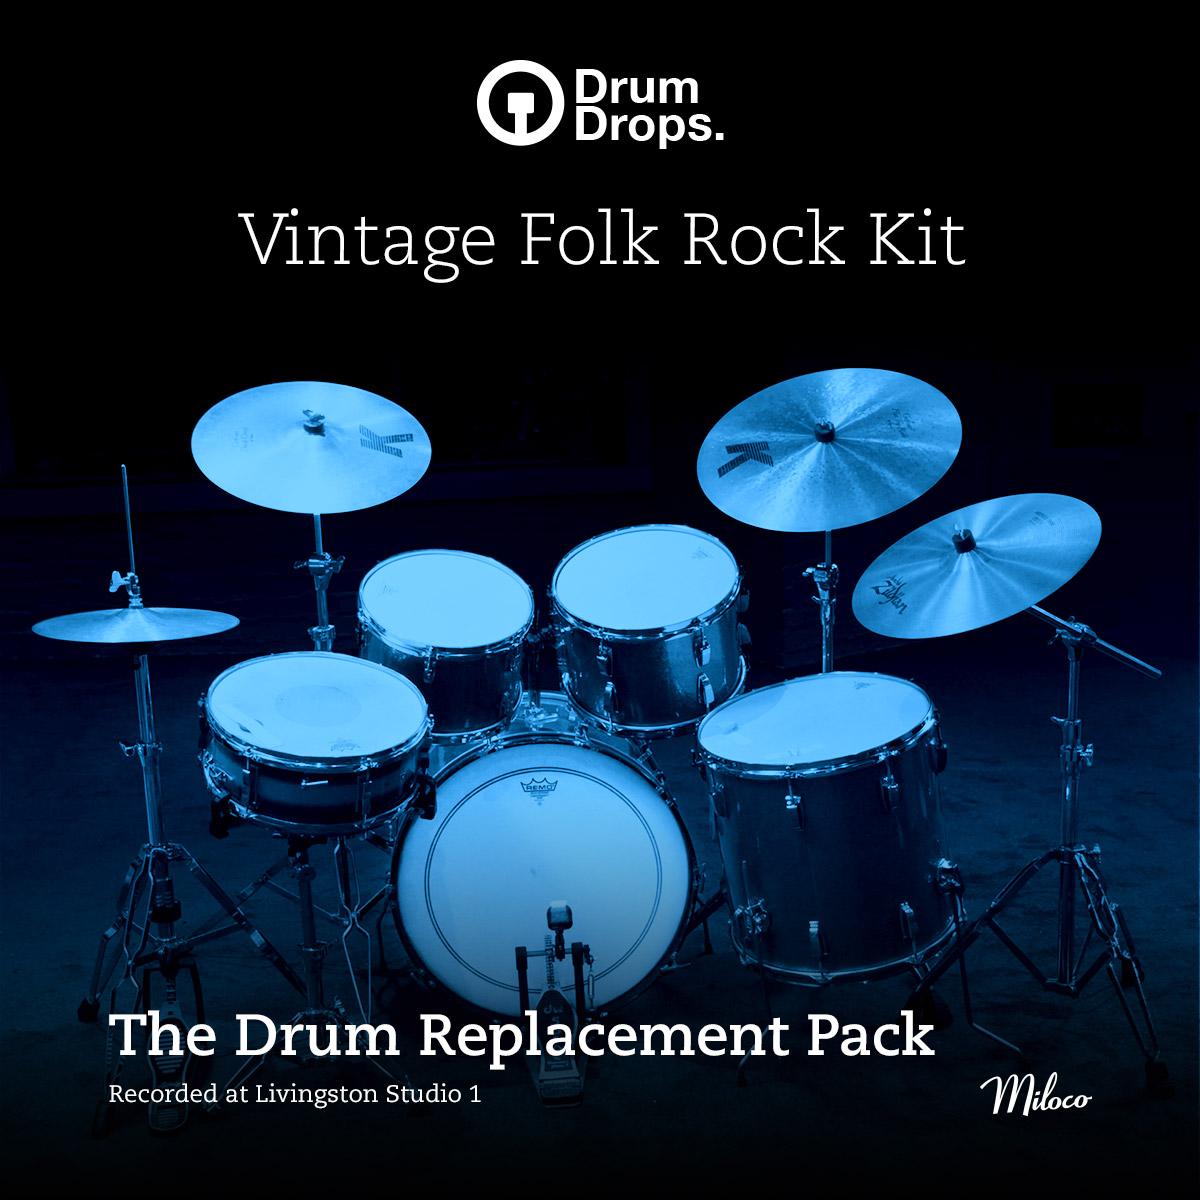 Vintage Folk Rock Kit - Drum Replacement Pack